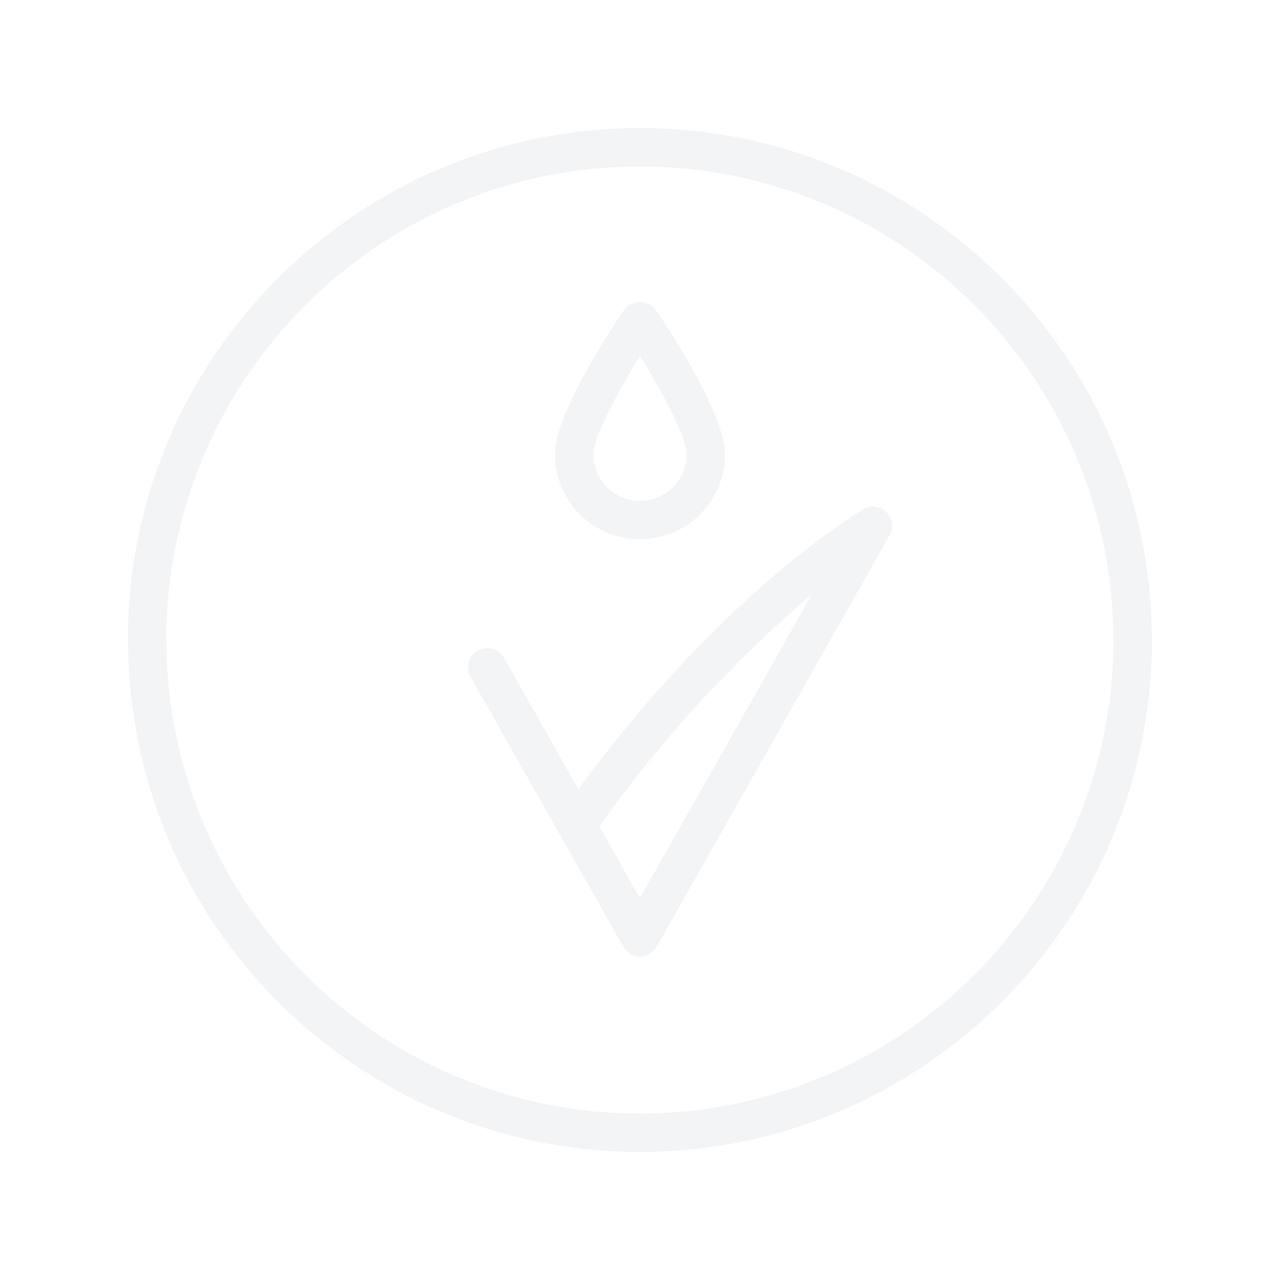 Shiseido Radiant Lifting Foundation SPF 15 30ml